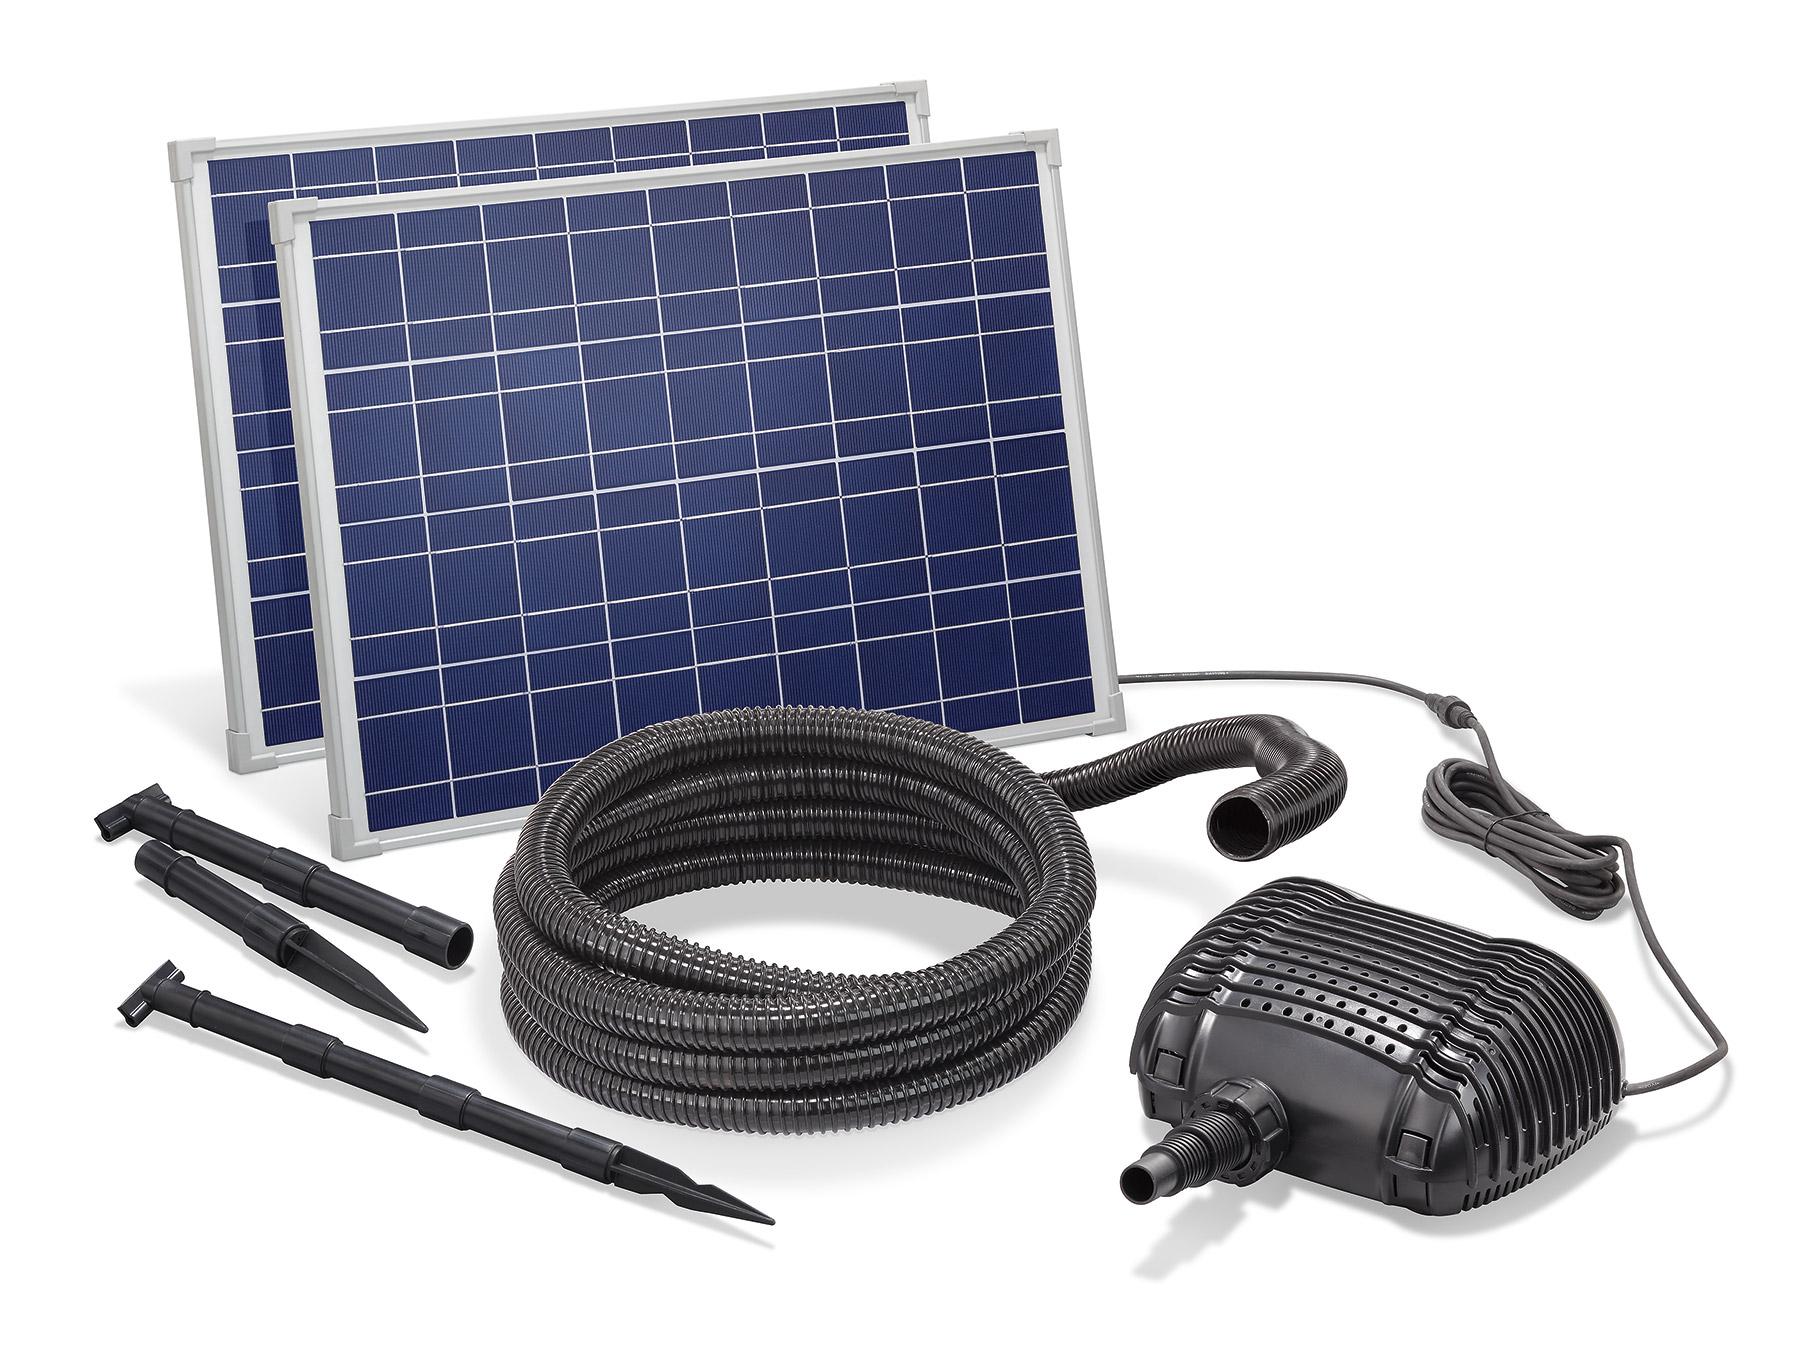 solar bachlaufpumpe 70w 3400l h solarpumpe wasserfall. Black Bedroom Furniture Sets. Home Design Ideas